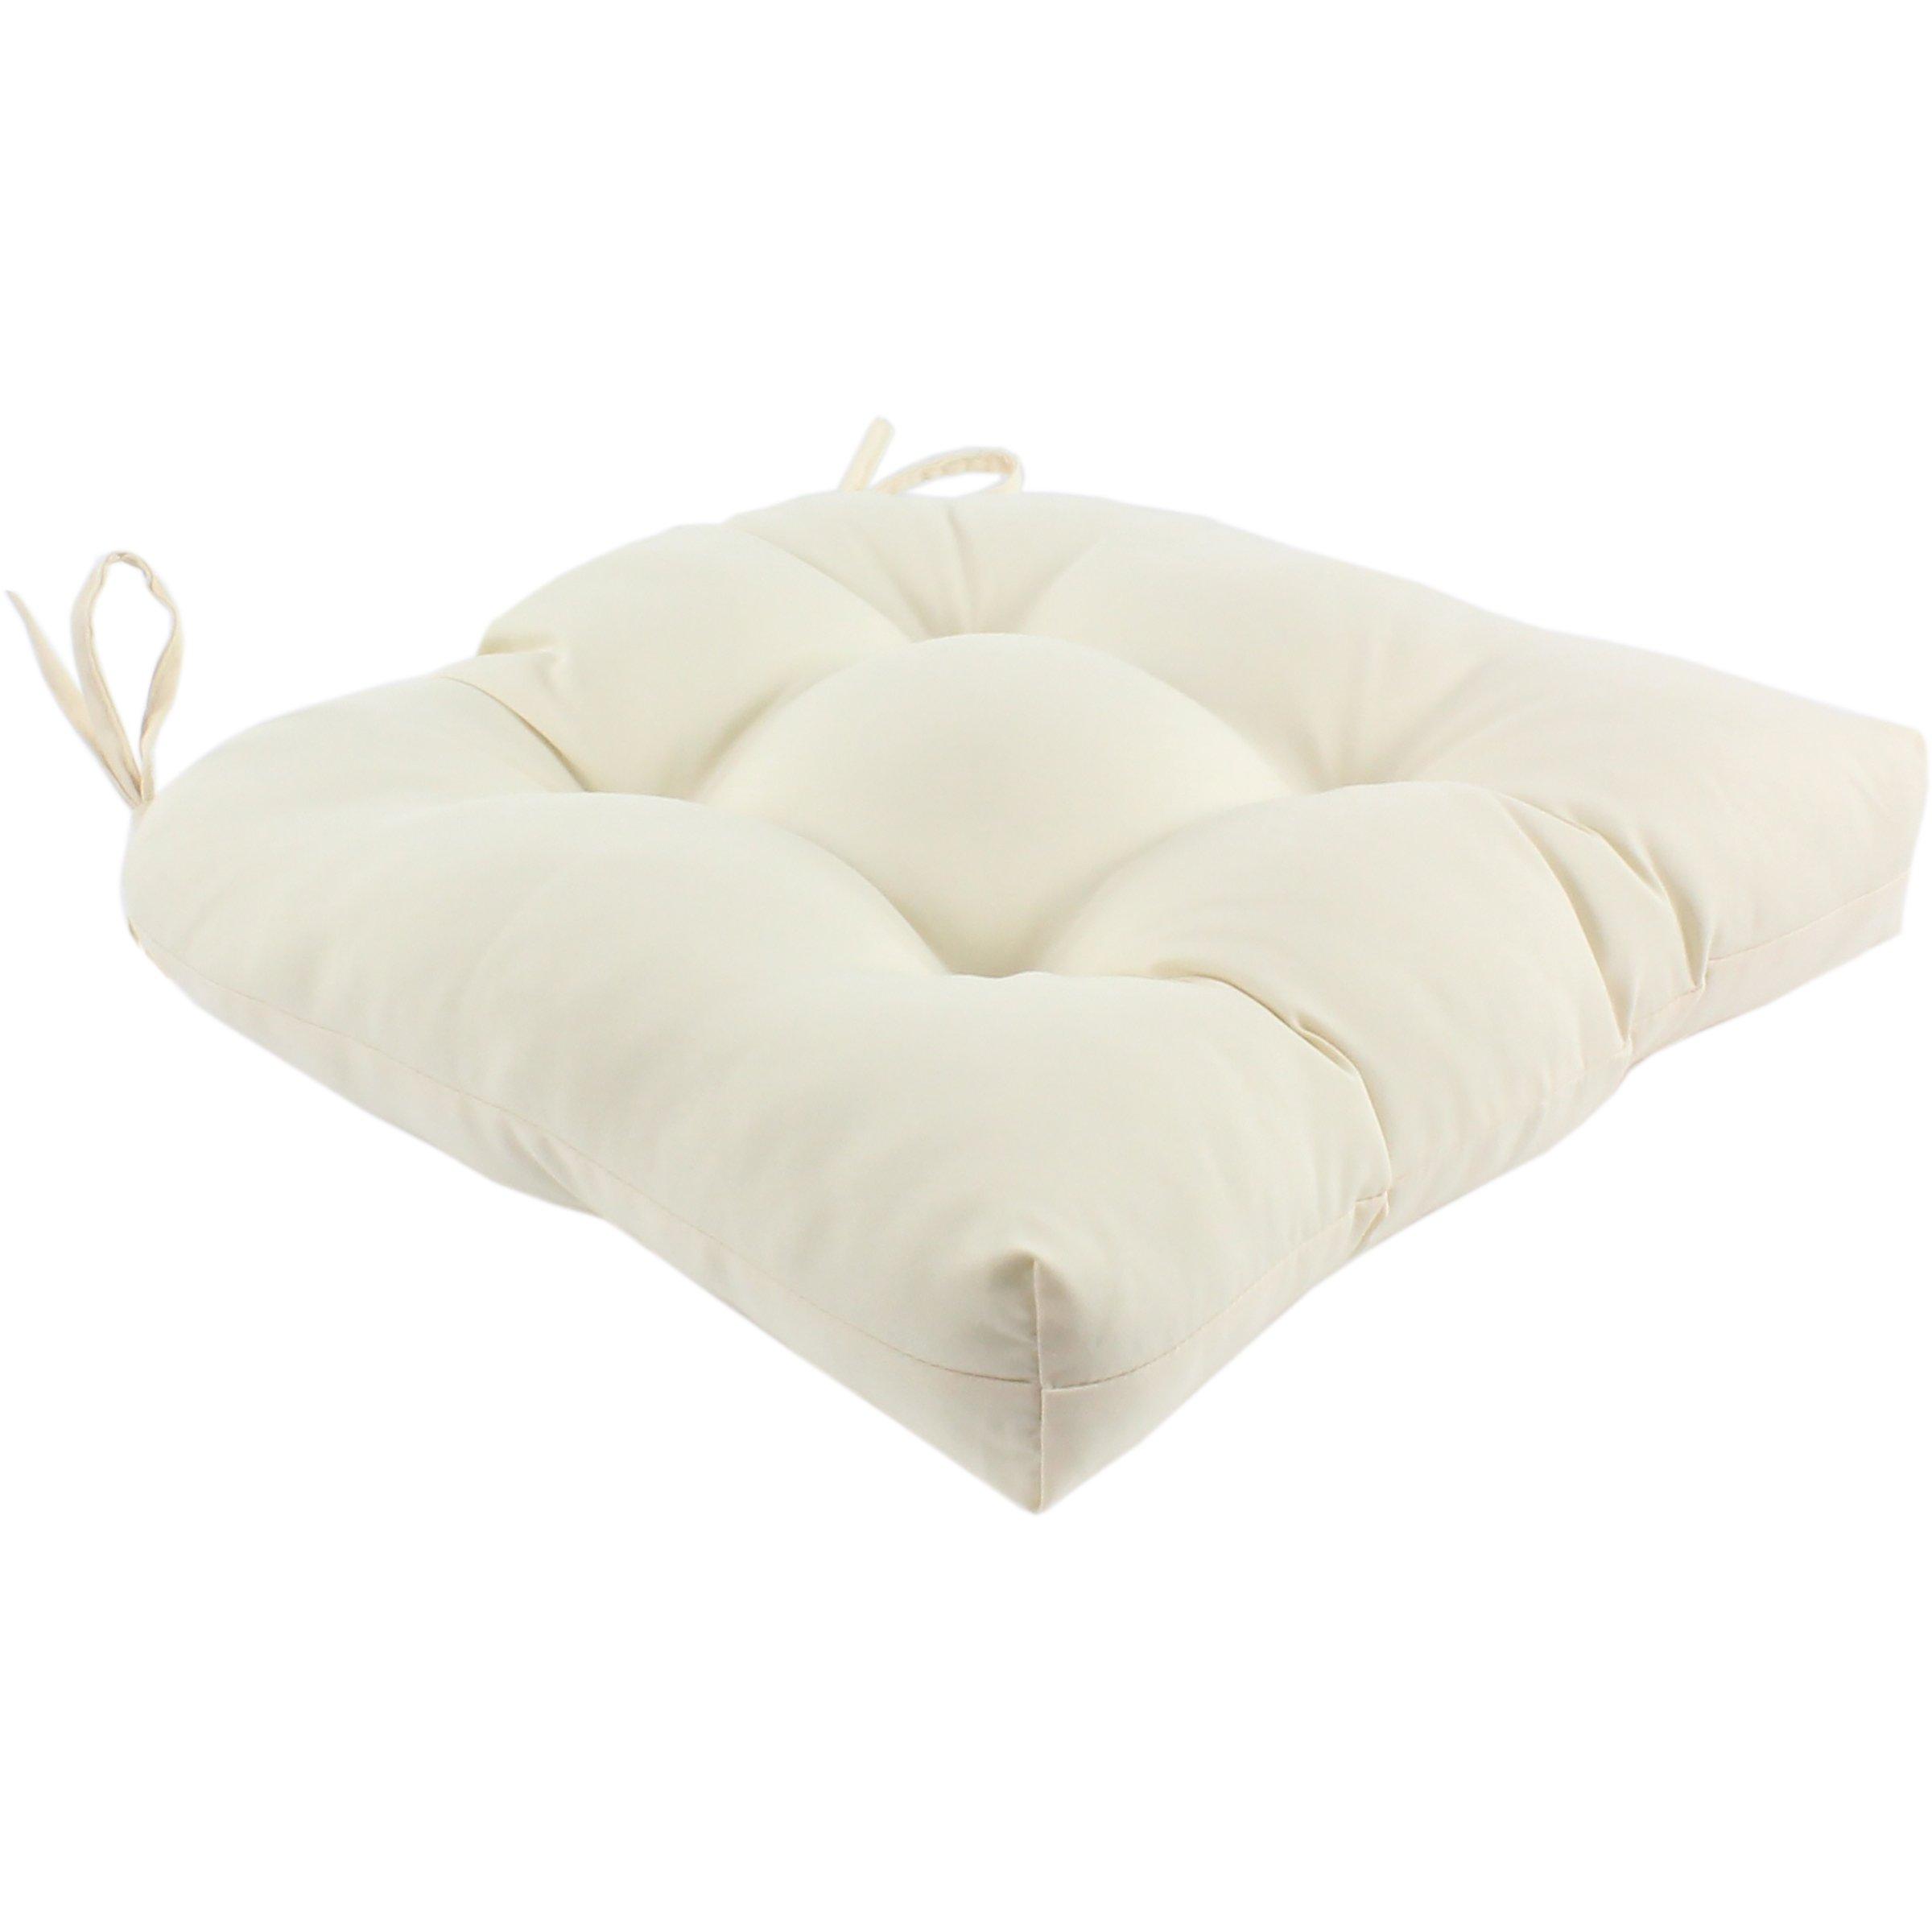 College Covers Indoor/Outdoor Seat Cushion Patio, Beige